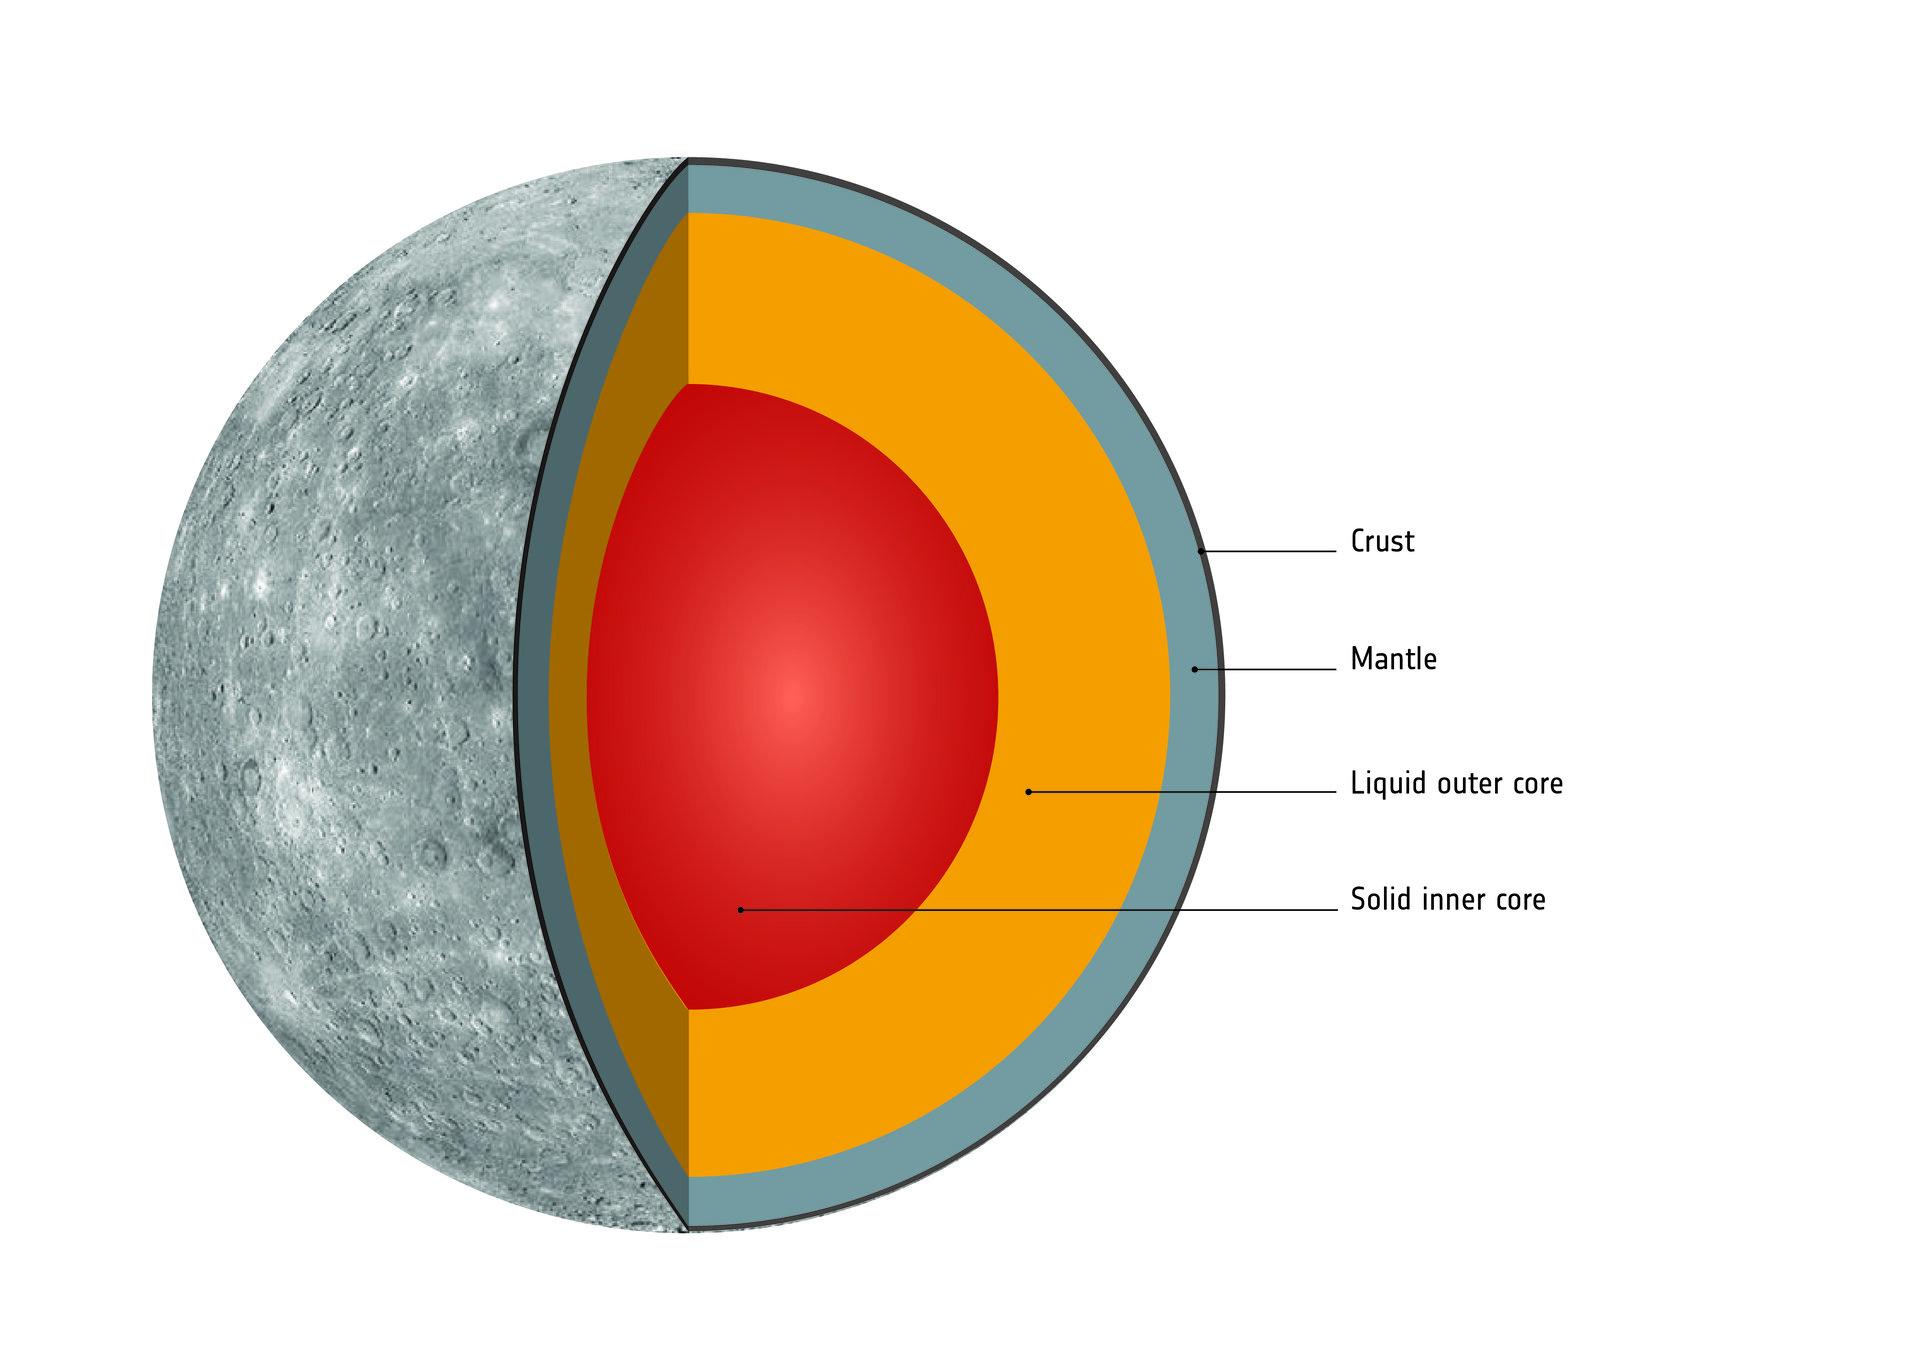 Esa Todo Sobre Mercurio